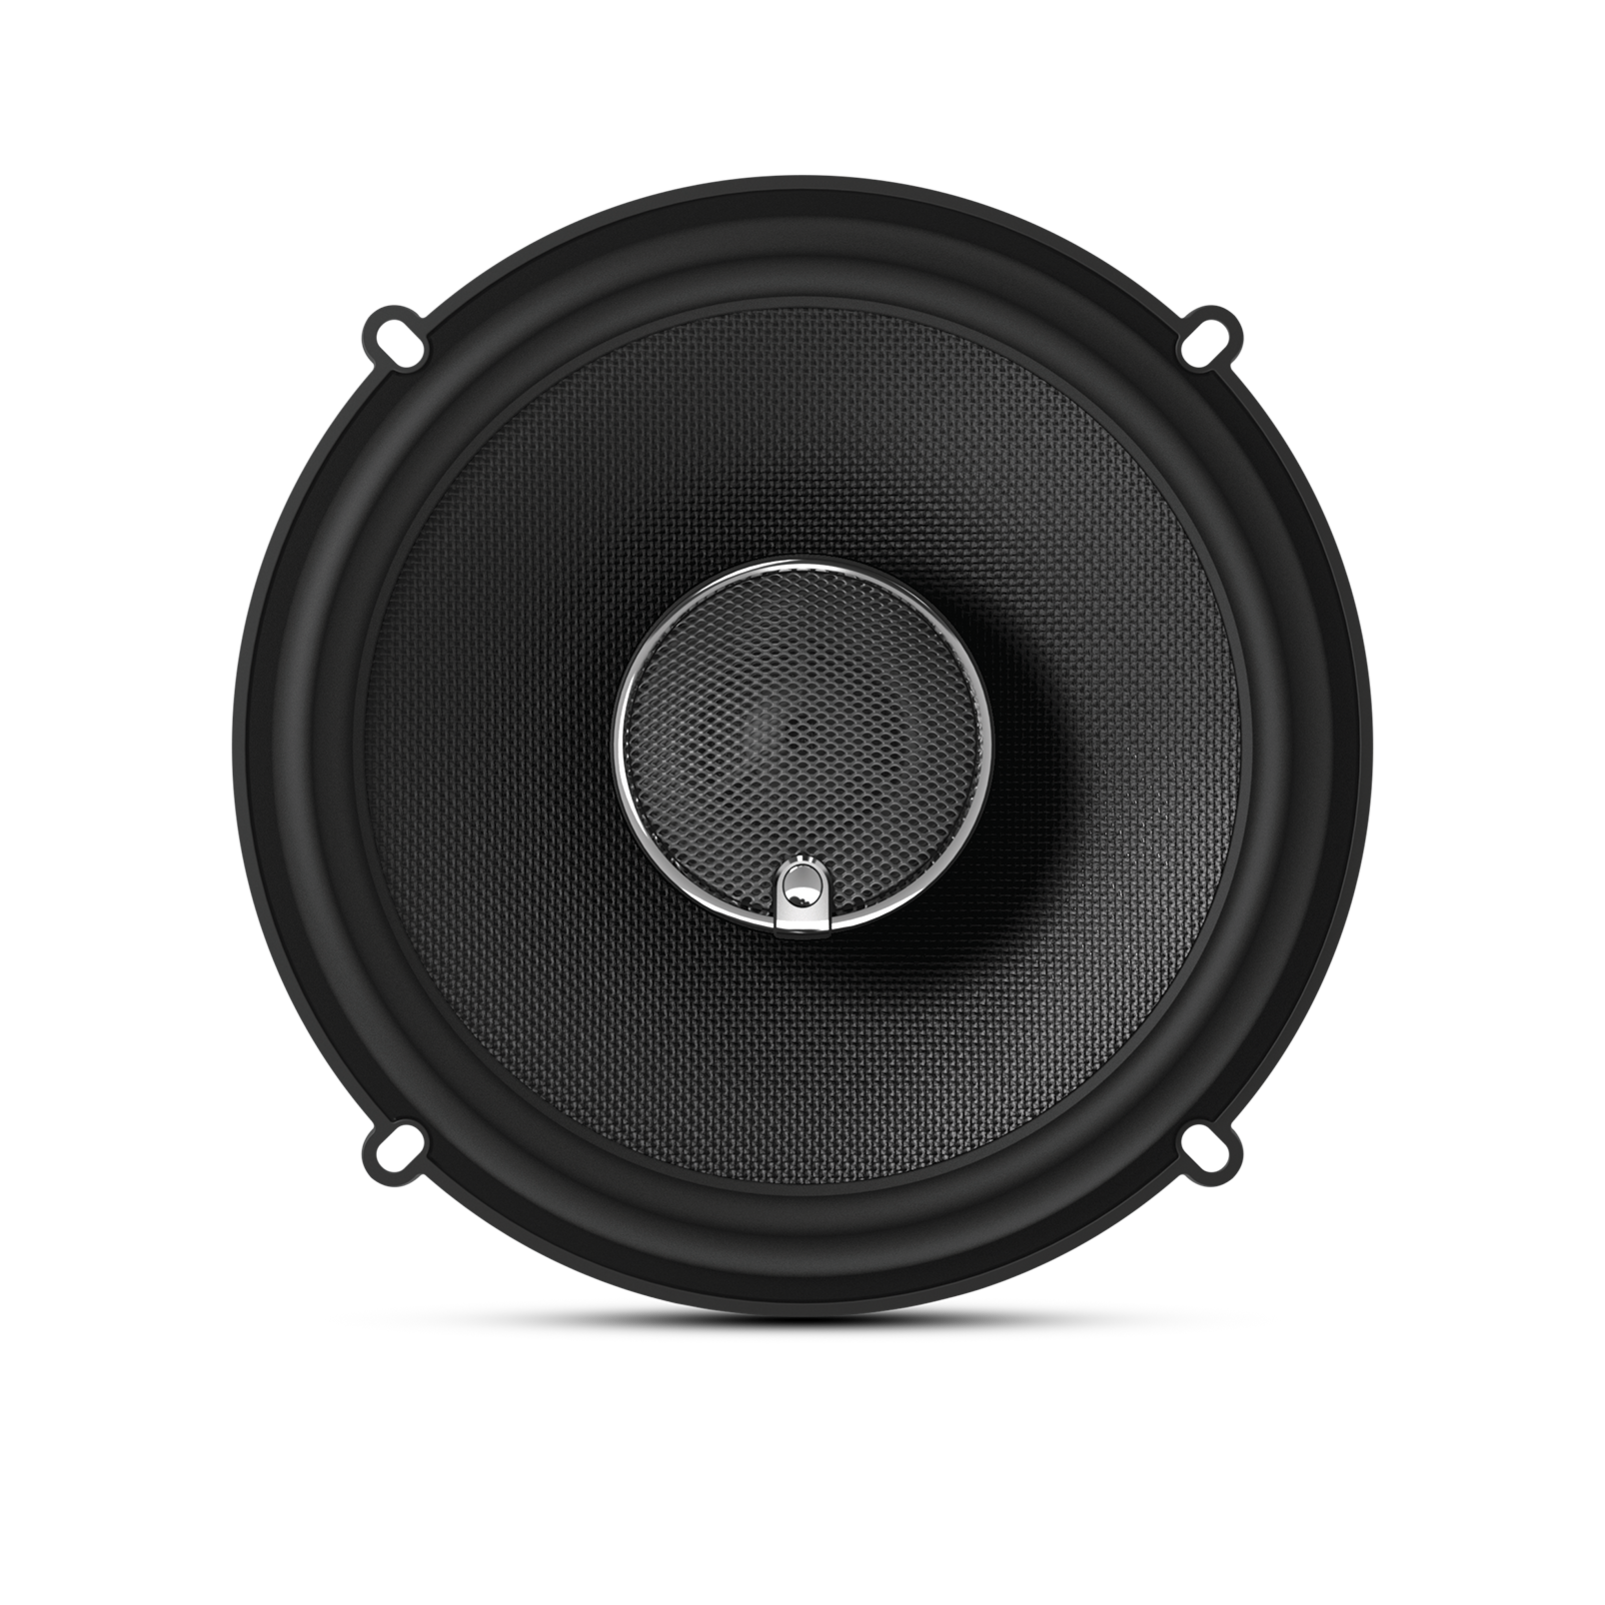 "Kappa 62.11i - Black - 6-1/2"" Two-Way Loudspeaker - Front"